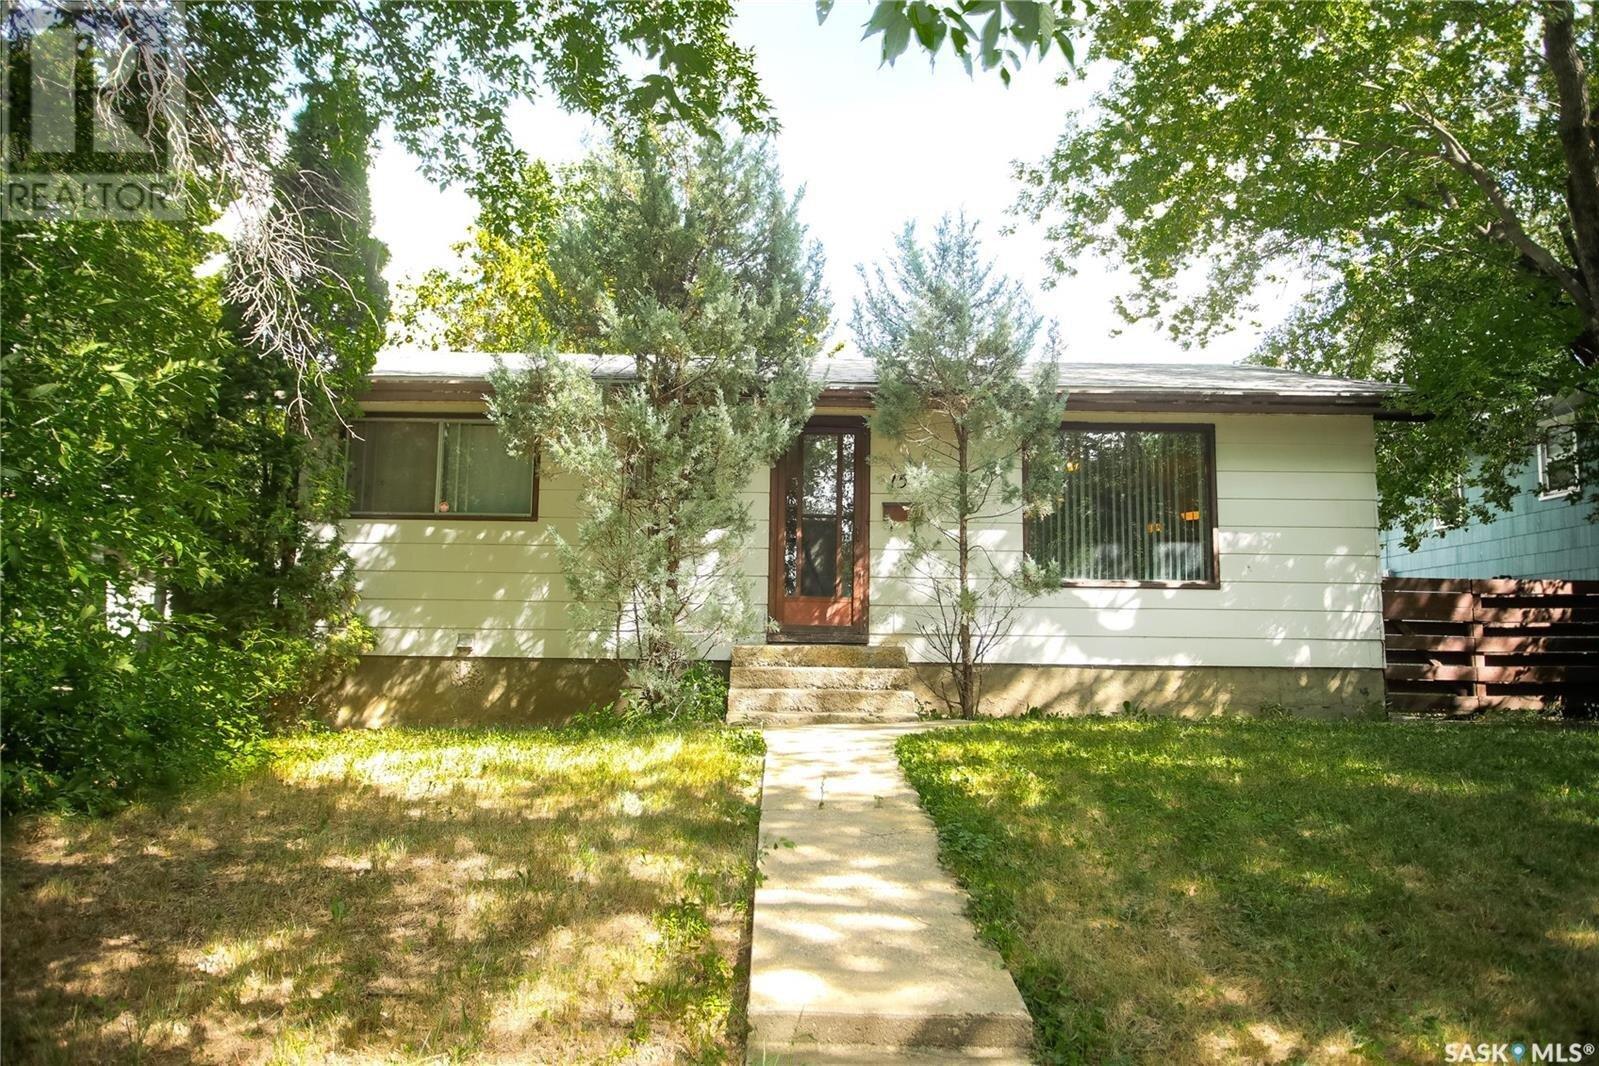 House for sale at 1510 H Ave N Saskatoon Saskatchewan - MLS: SK833794